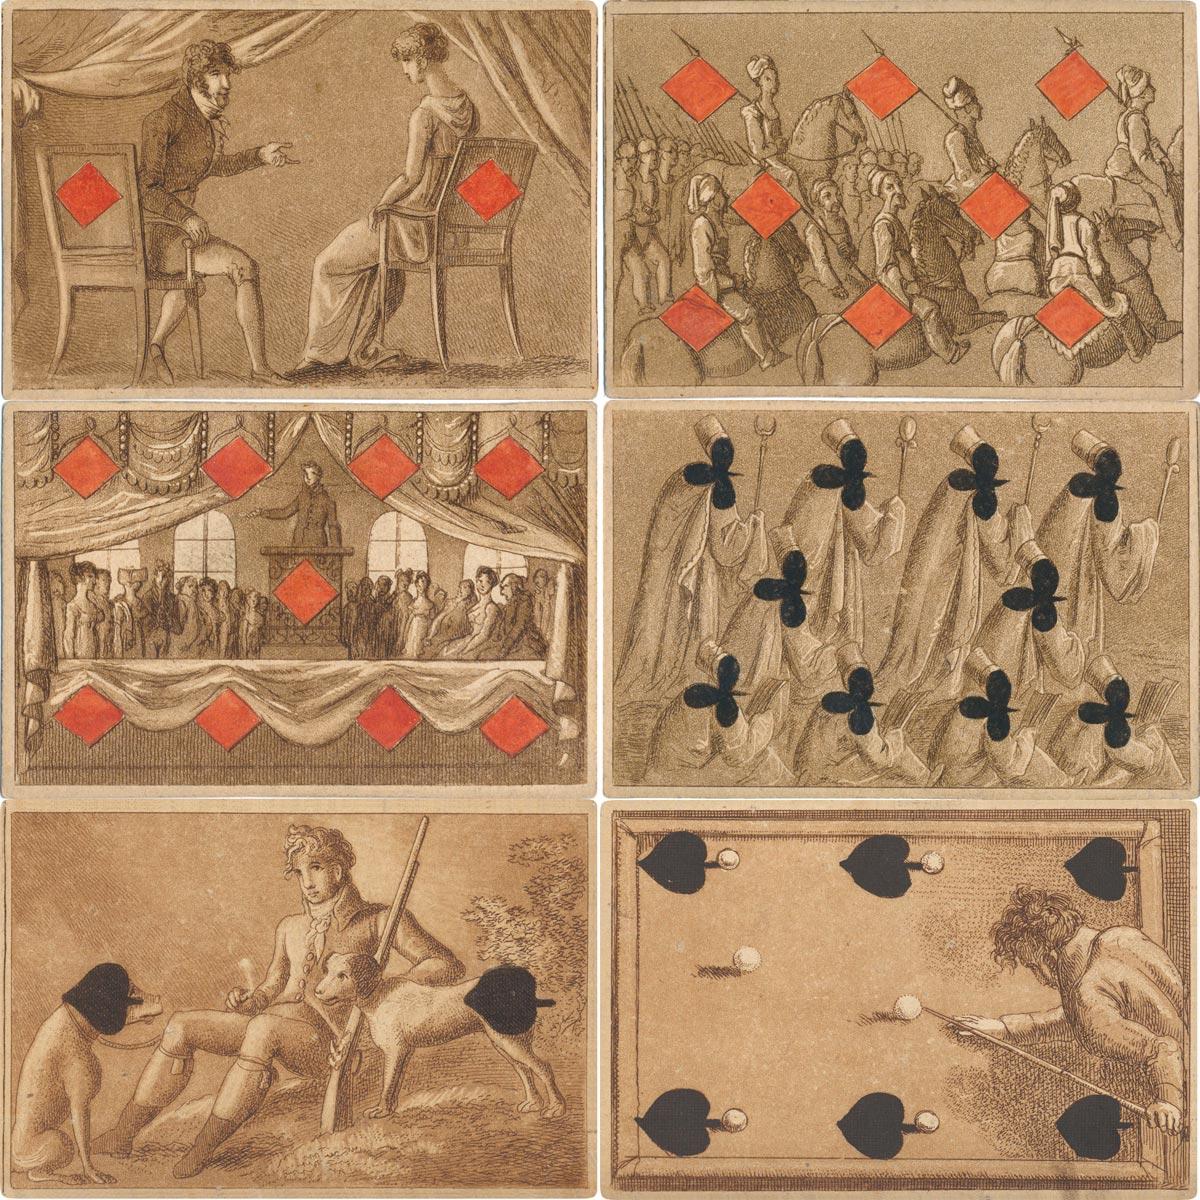 Transformation cards designed and etched by Vincenz Raimund Grüner, Vienna, 1809